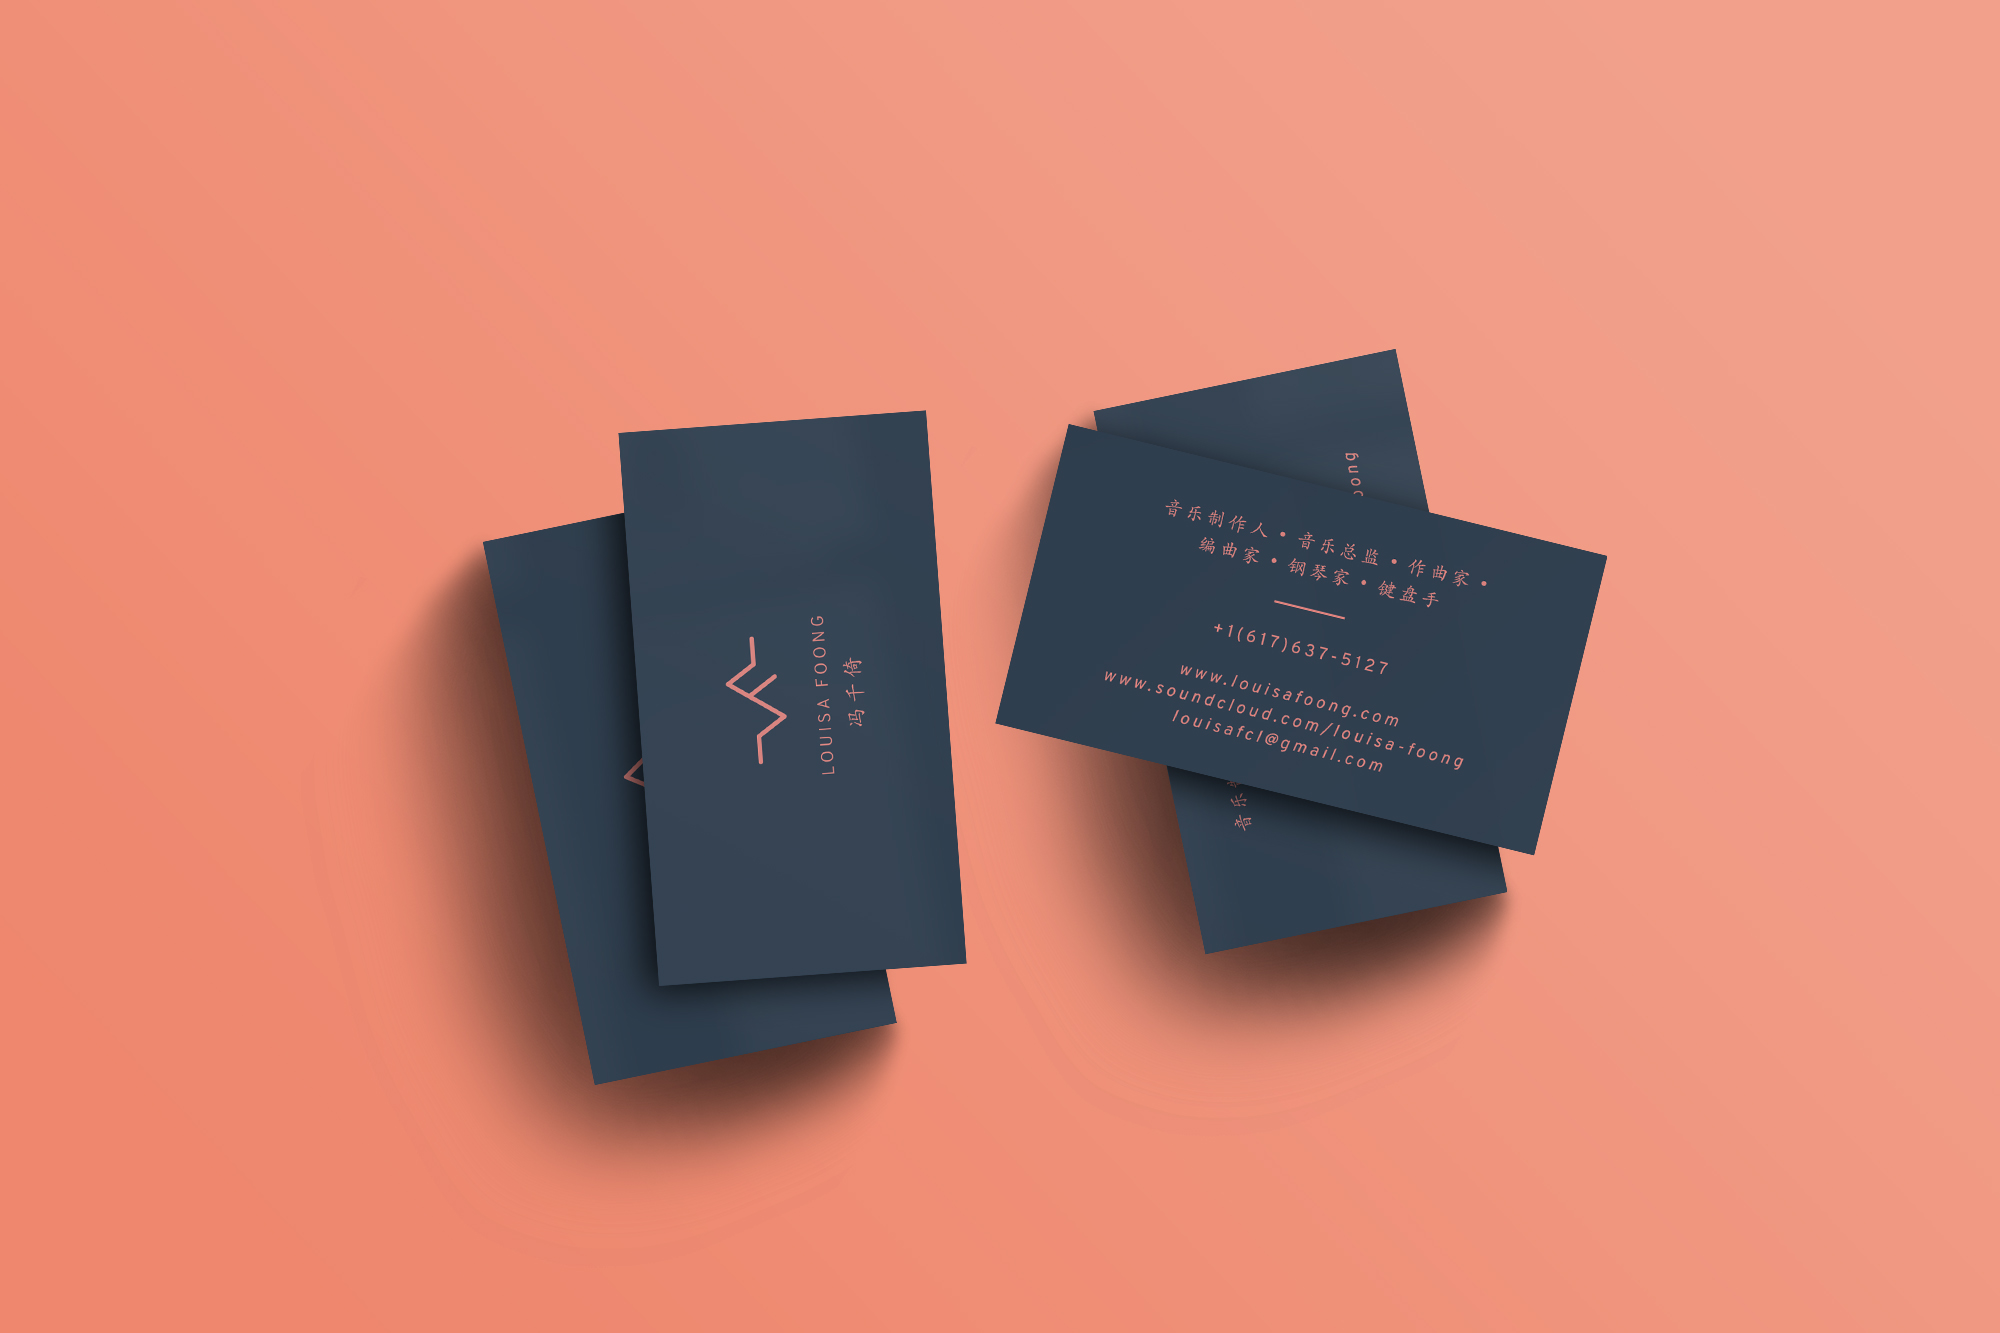 Louisa-Card-MockUp-2.jpg